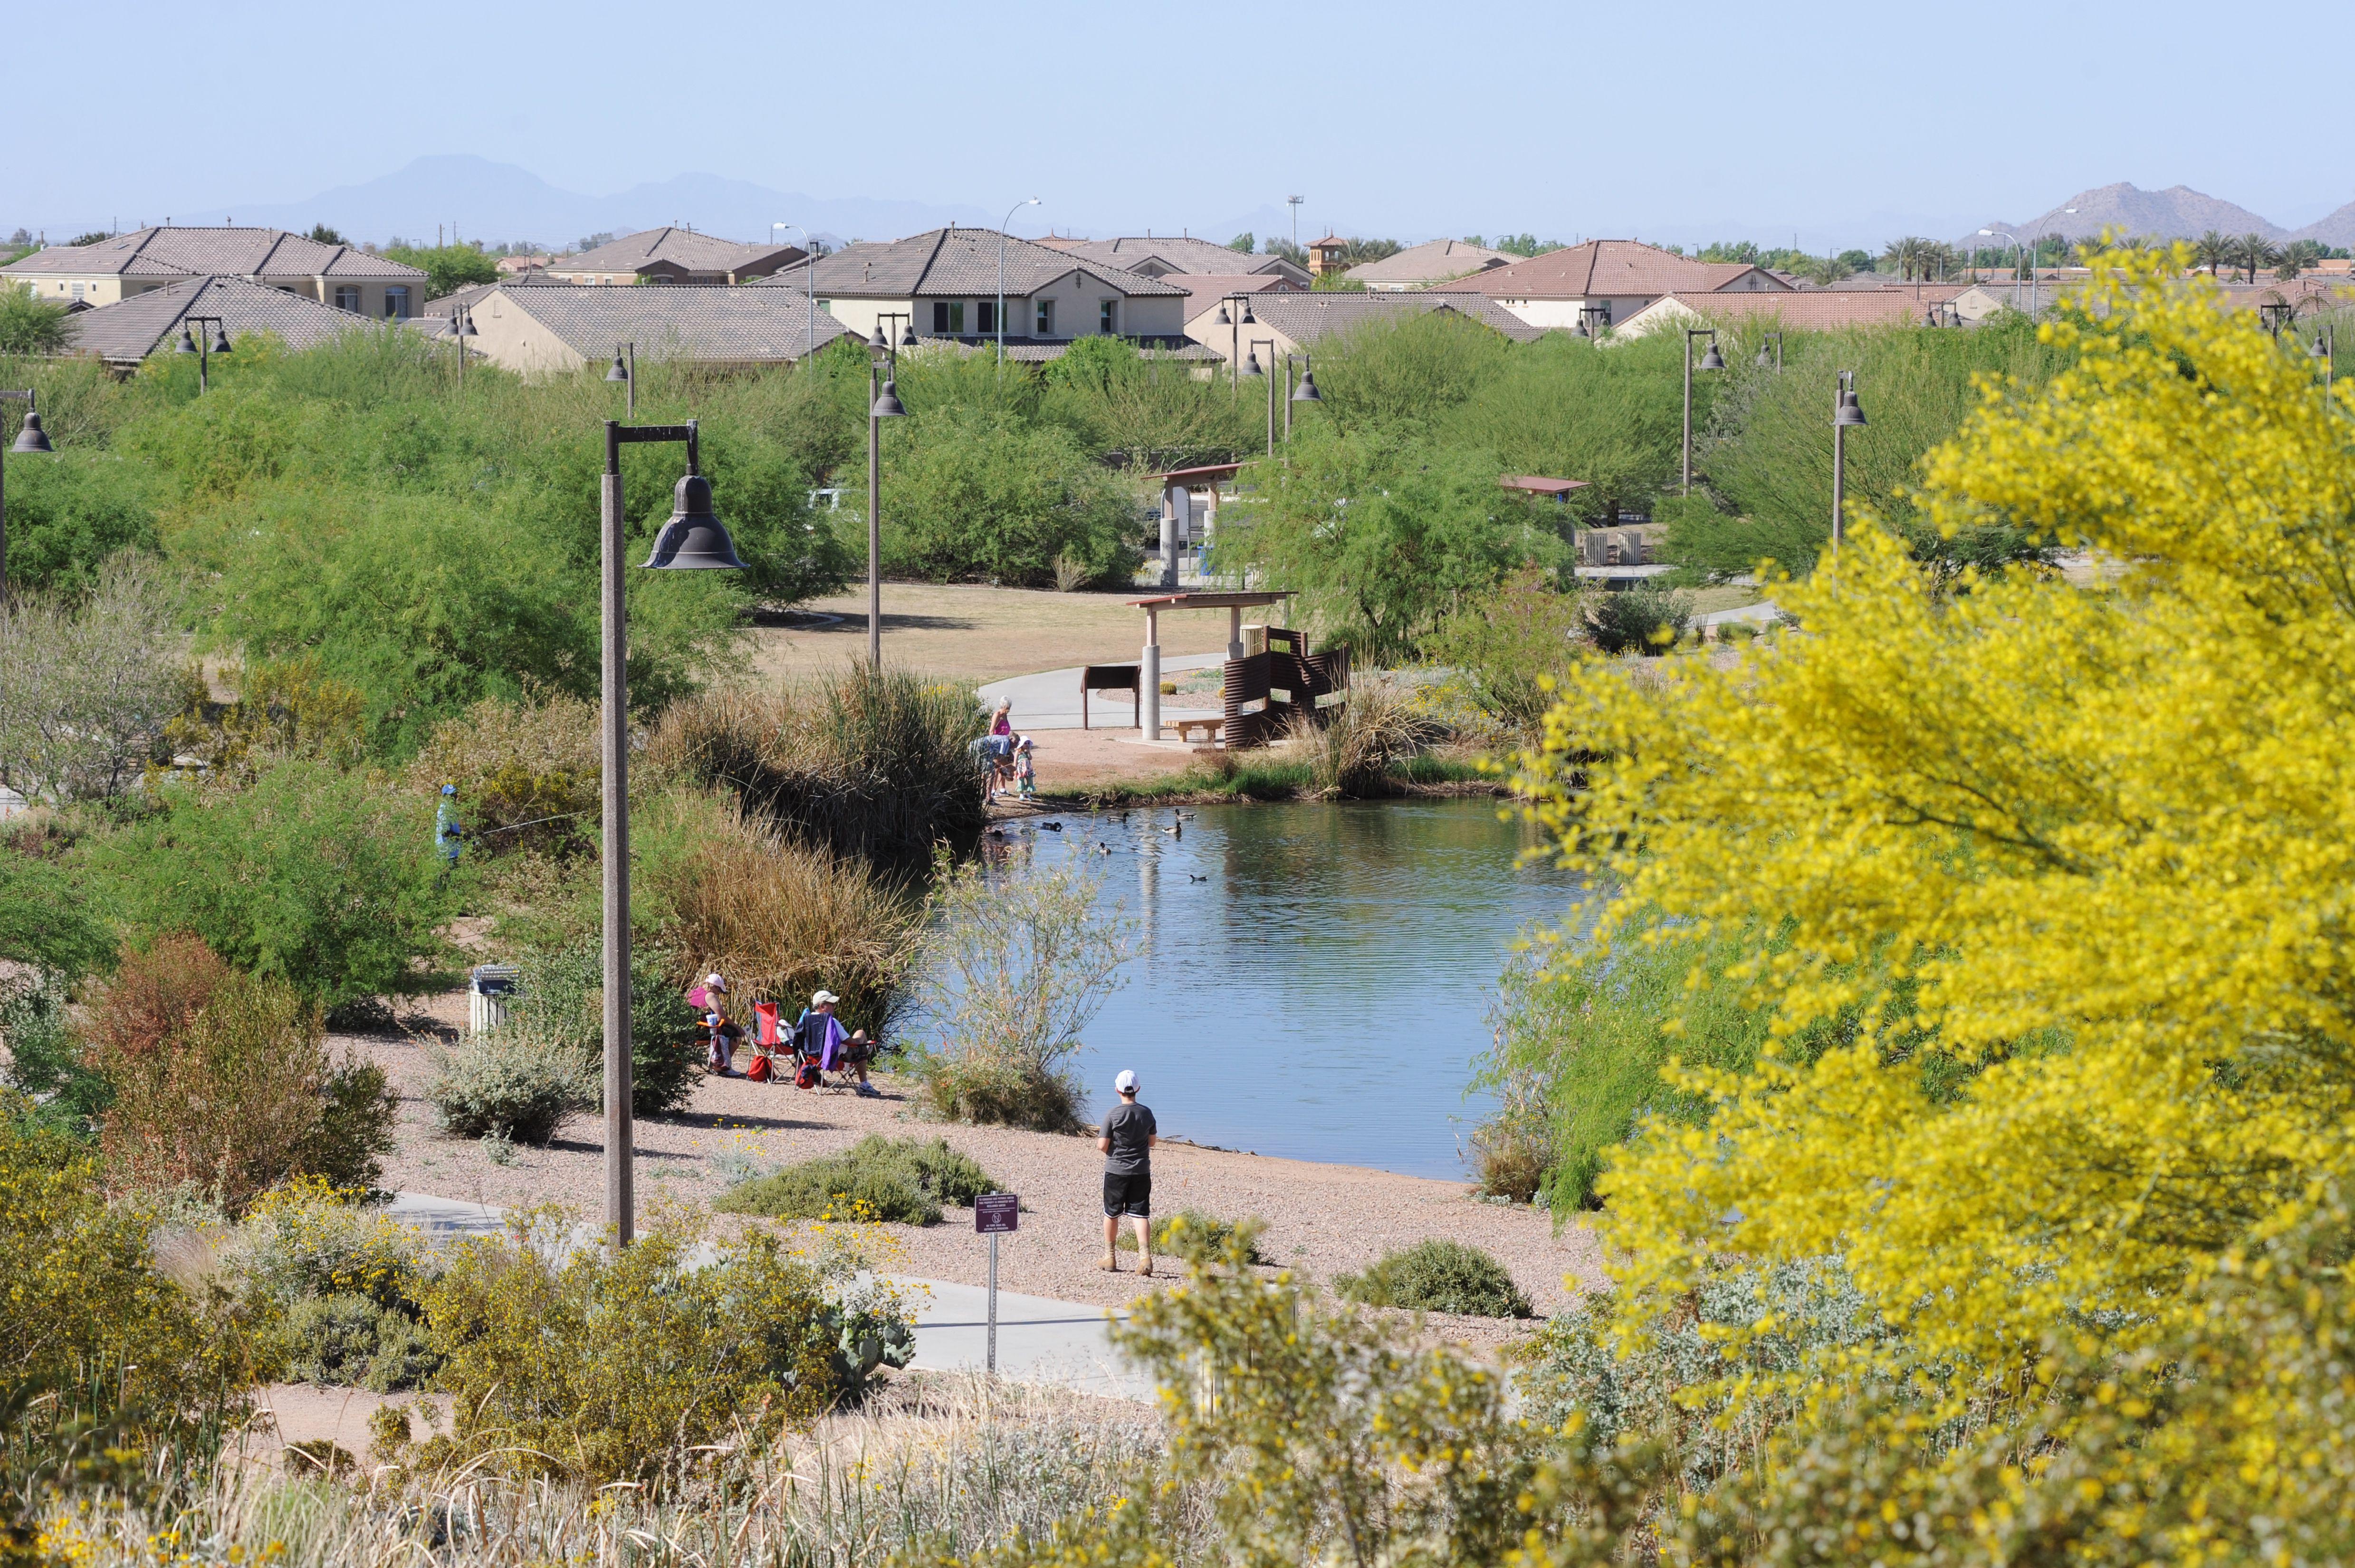 Veterans Oasis Park and Environmental Education Center